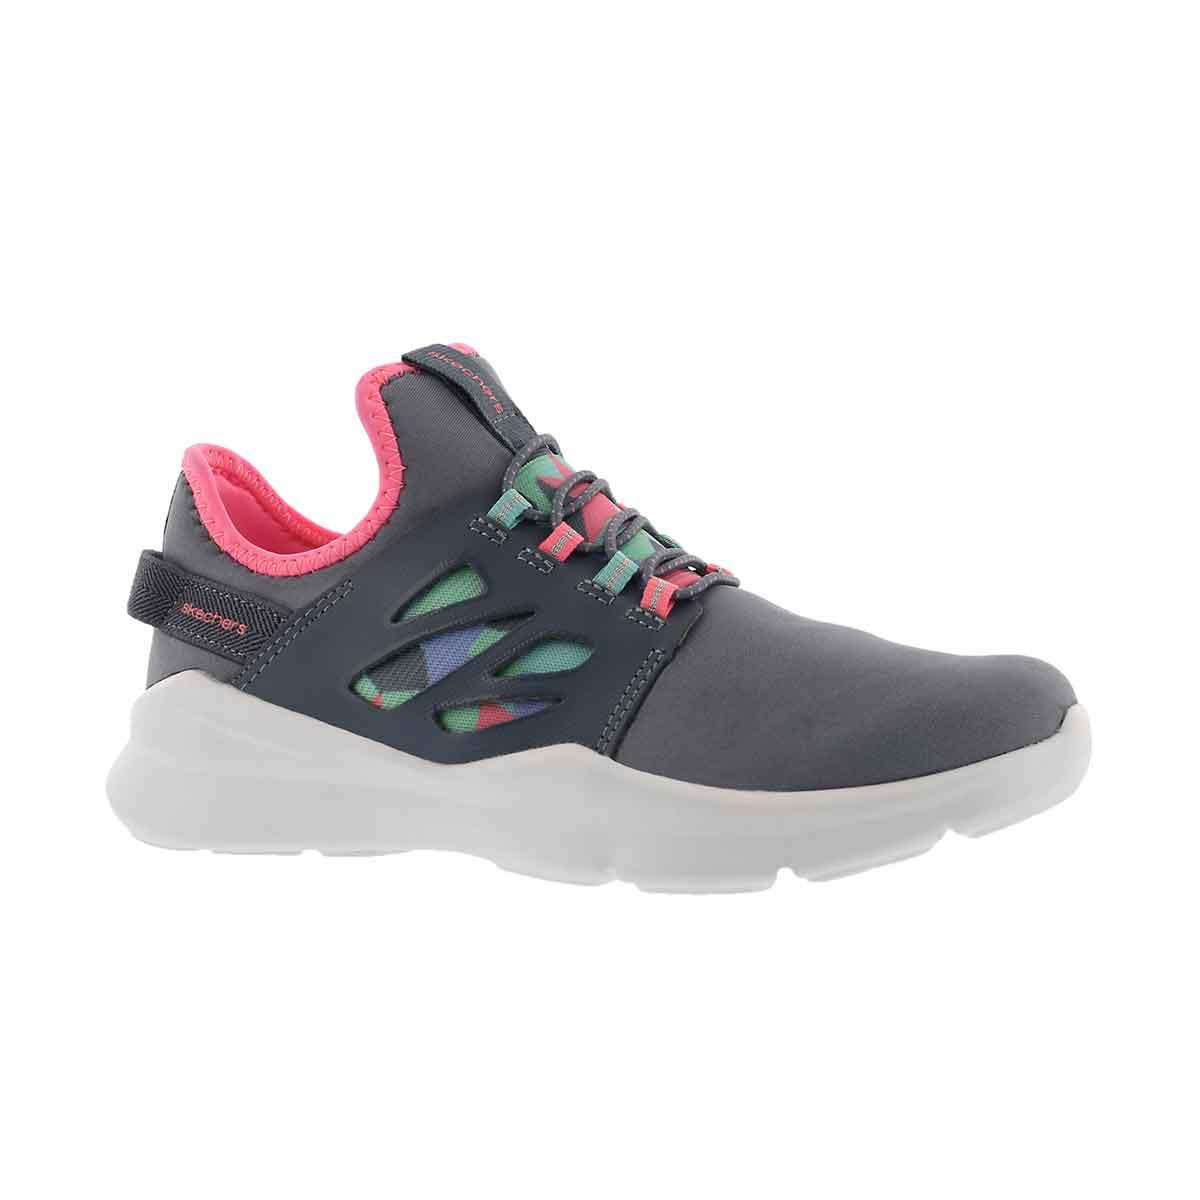 Girls' STREET SQUAD grey/multi slip on sneakers